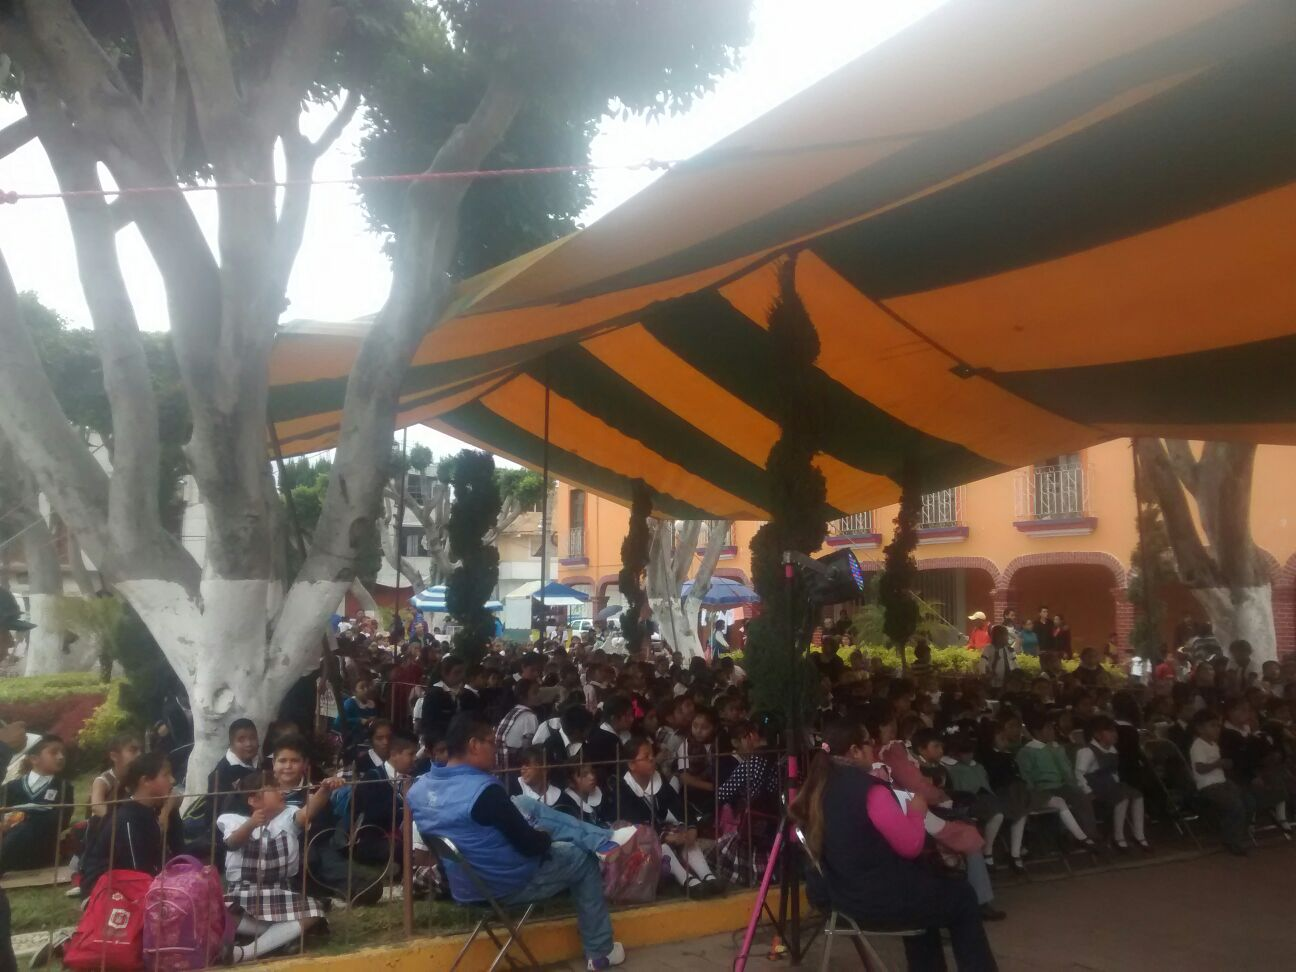 Titiriteros de Monterrey se despidieron con éxito en Tetlatlahuca